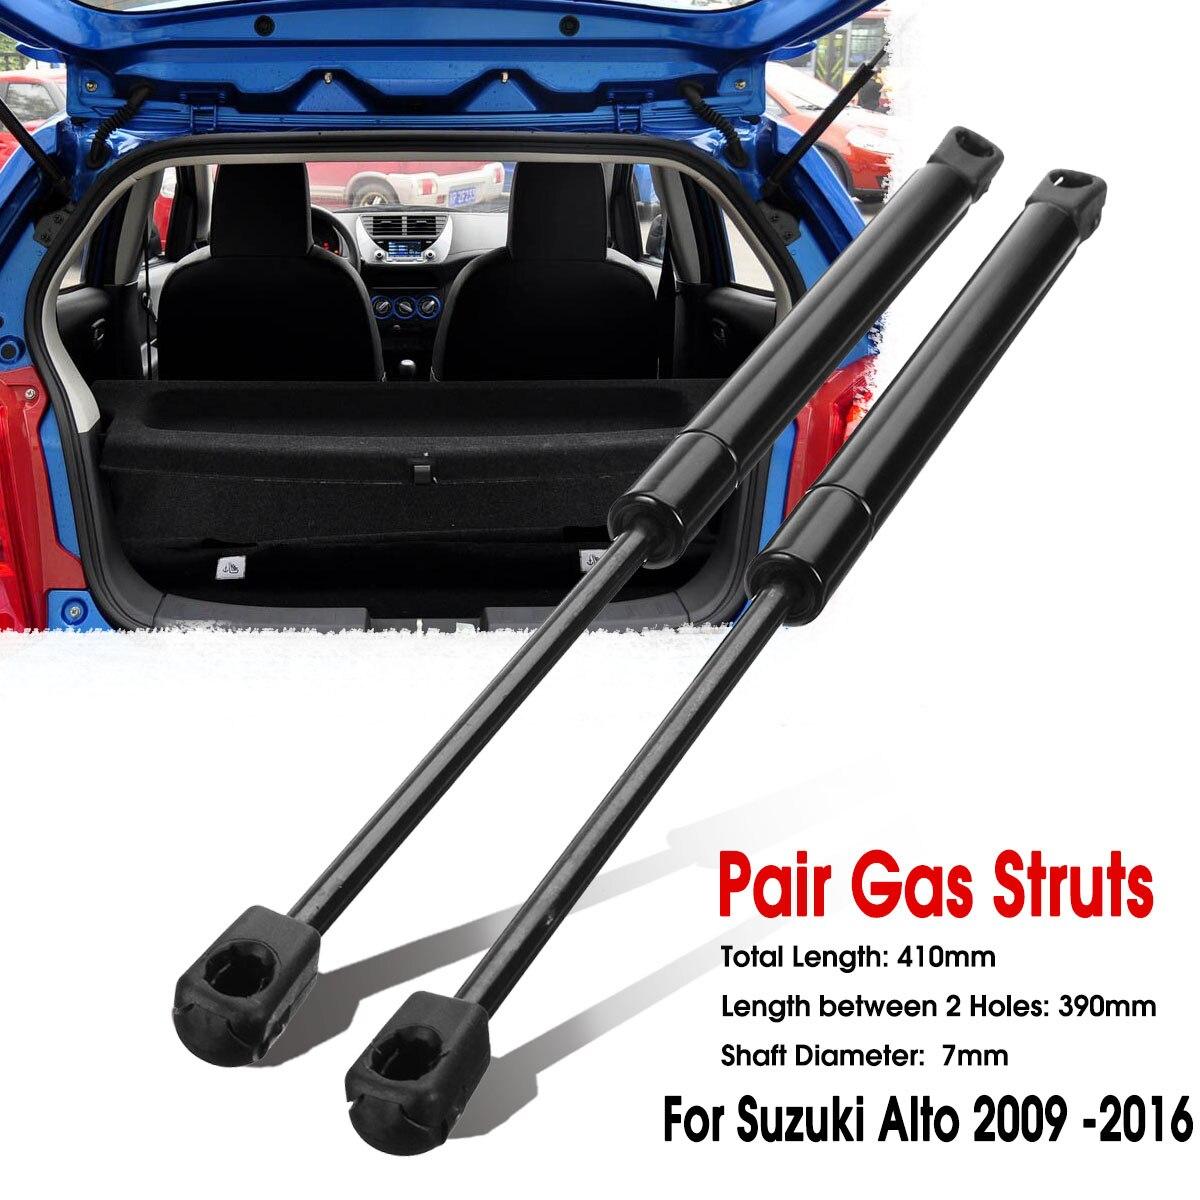 2pcs รถด้านหลัง Tailgate BOOT แก๊ส Struts สนับสนุนบาร์สำหรับ Suzuki Alto HA25 HA35 2009 2010 2011 2012 2013 2014 2015 2016